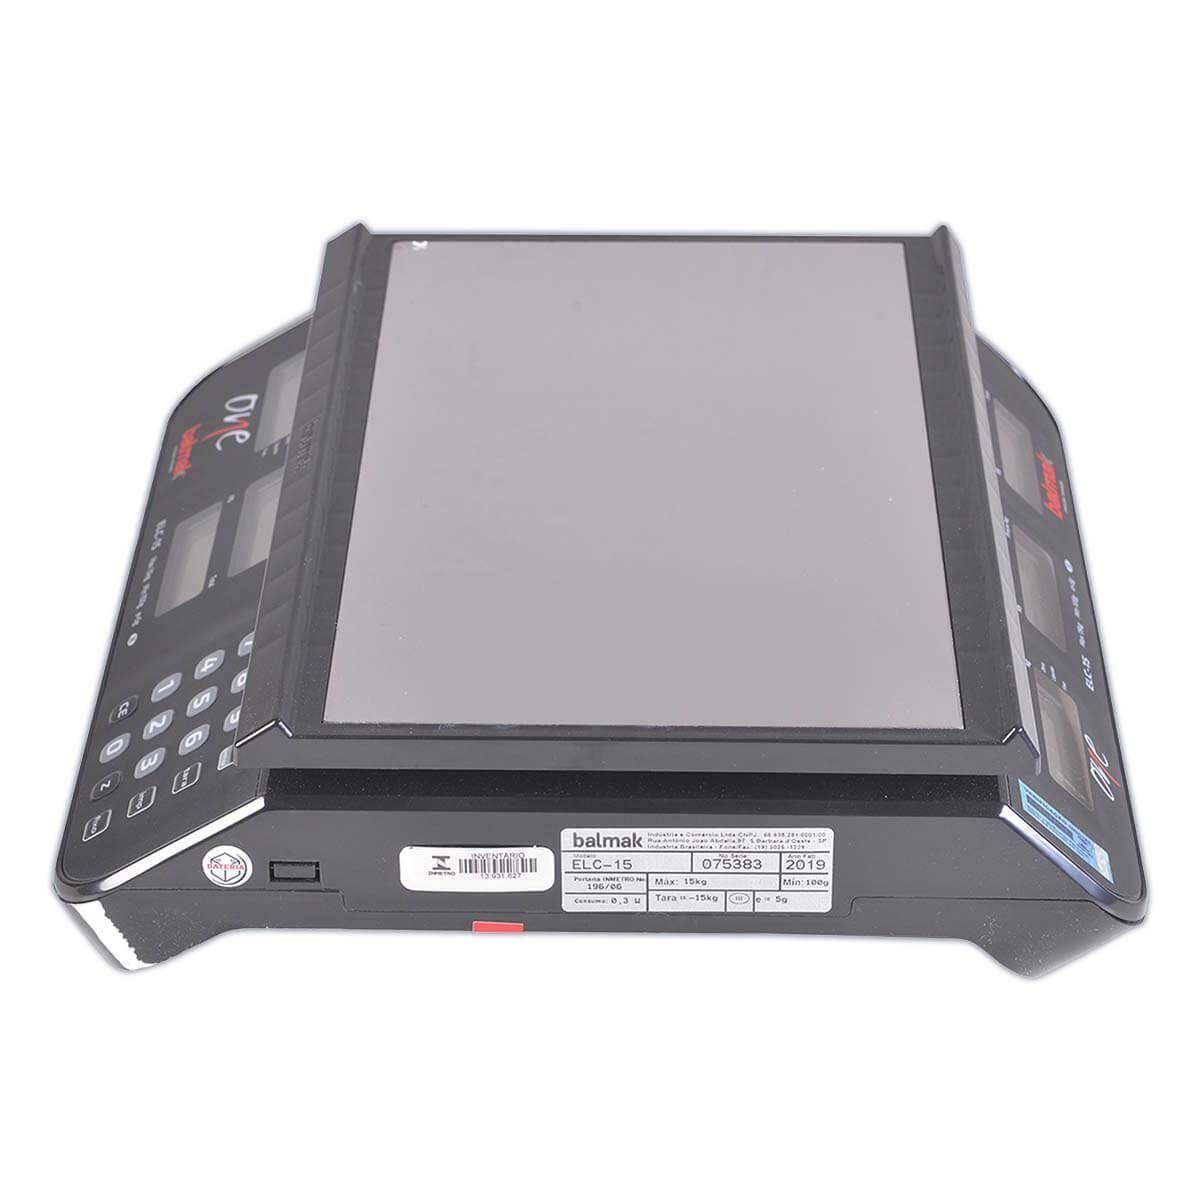 Balança Digital Computadora 15Kg ELCO15 - Balmak